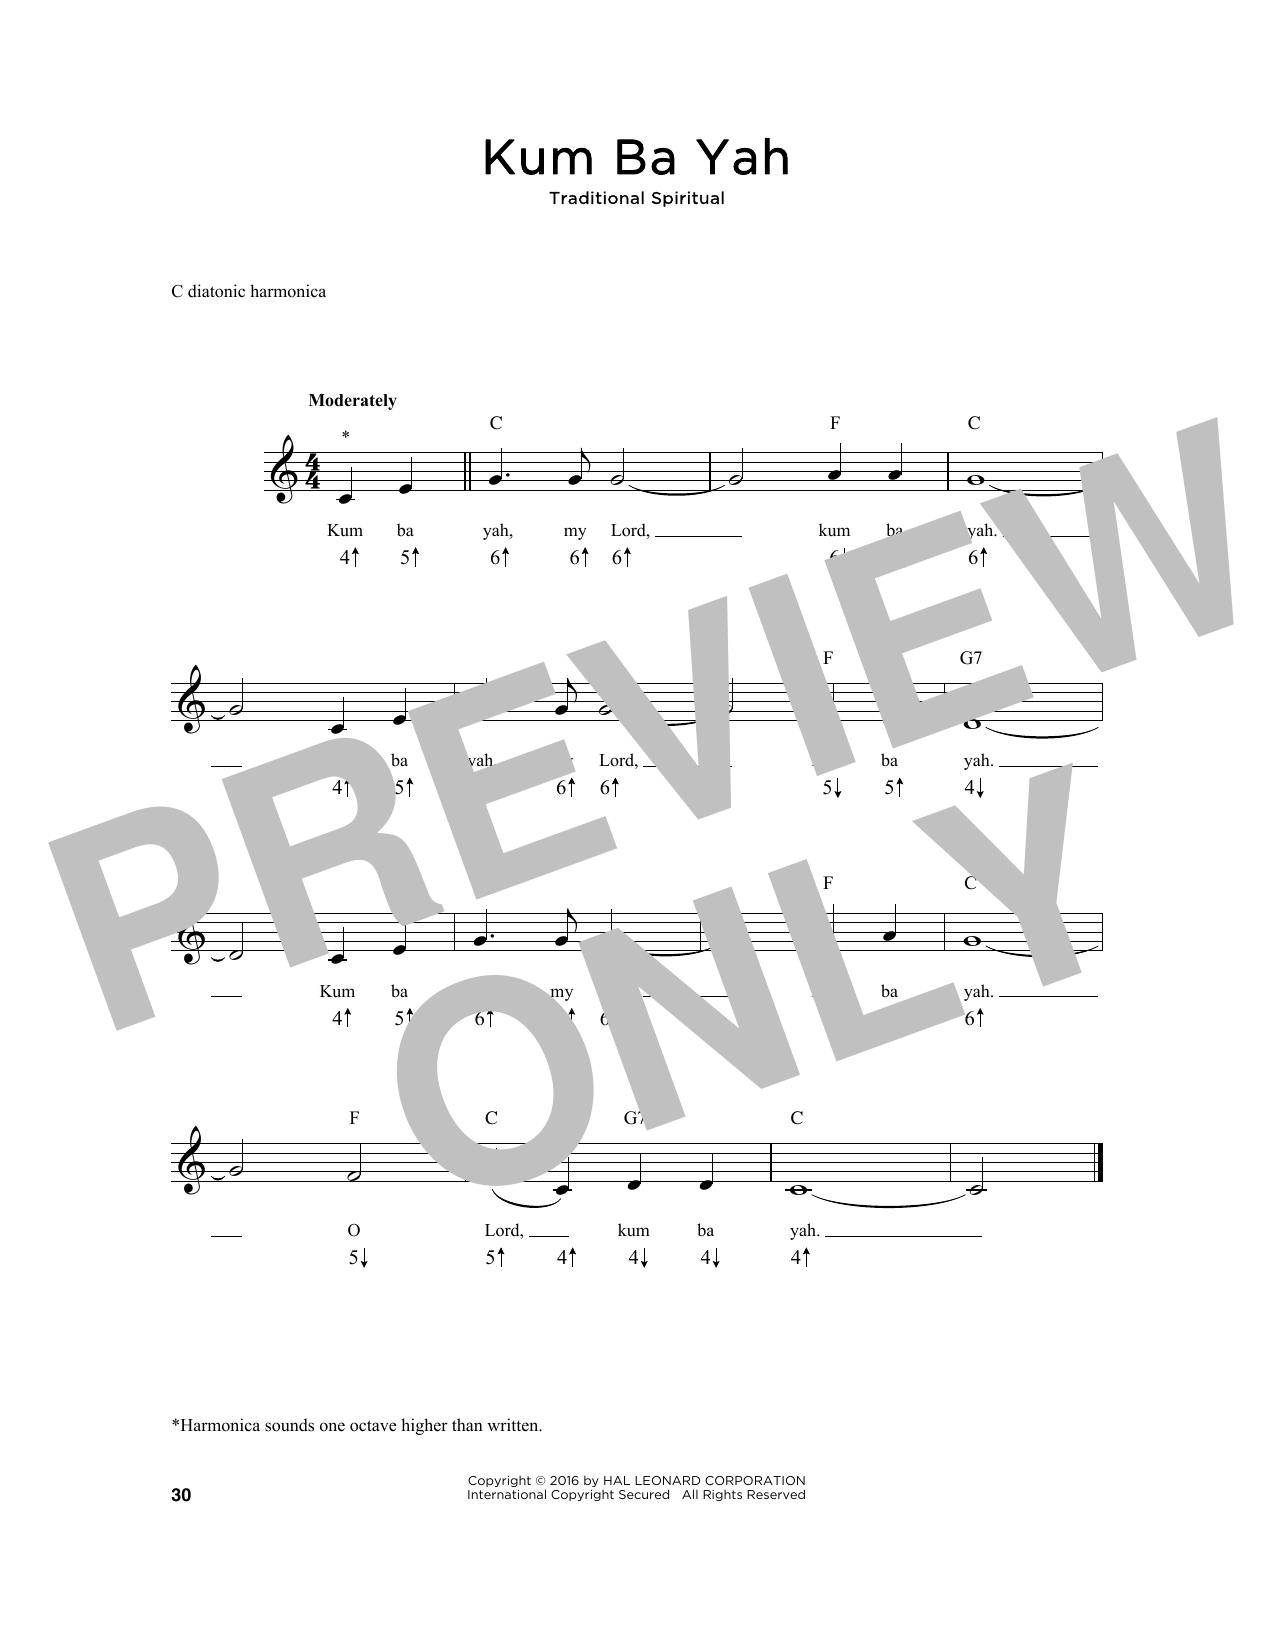 Kum Ba Yah (Harmonica)